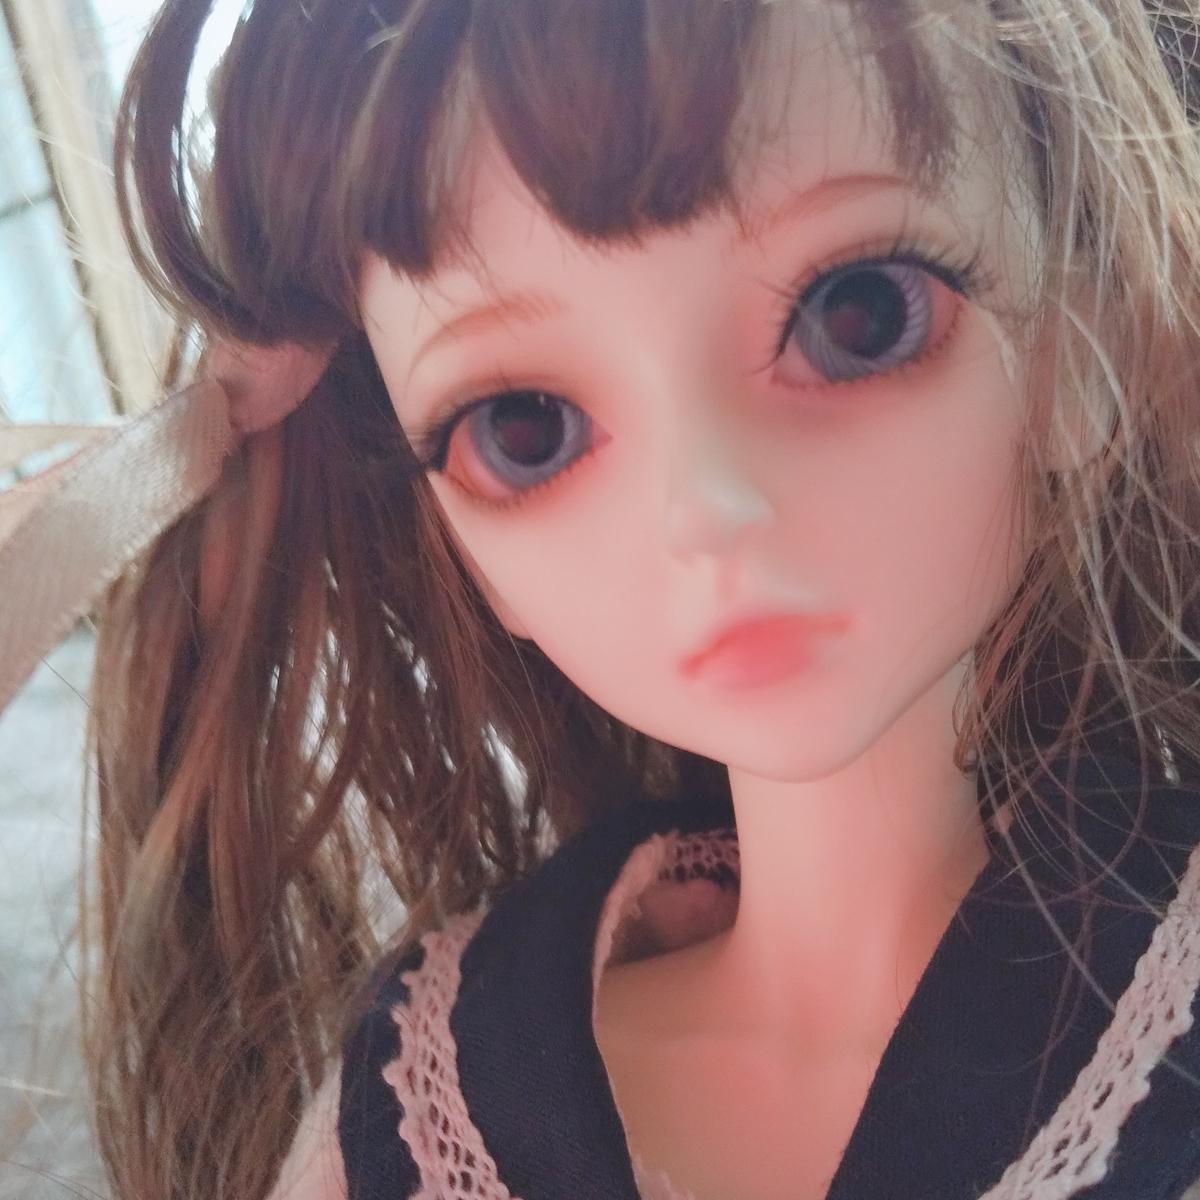 f:id:suikaikyouna:20190508152908j:plain